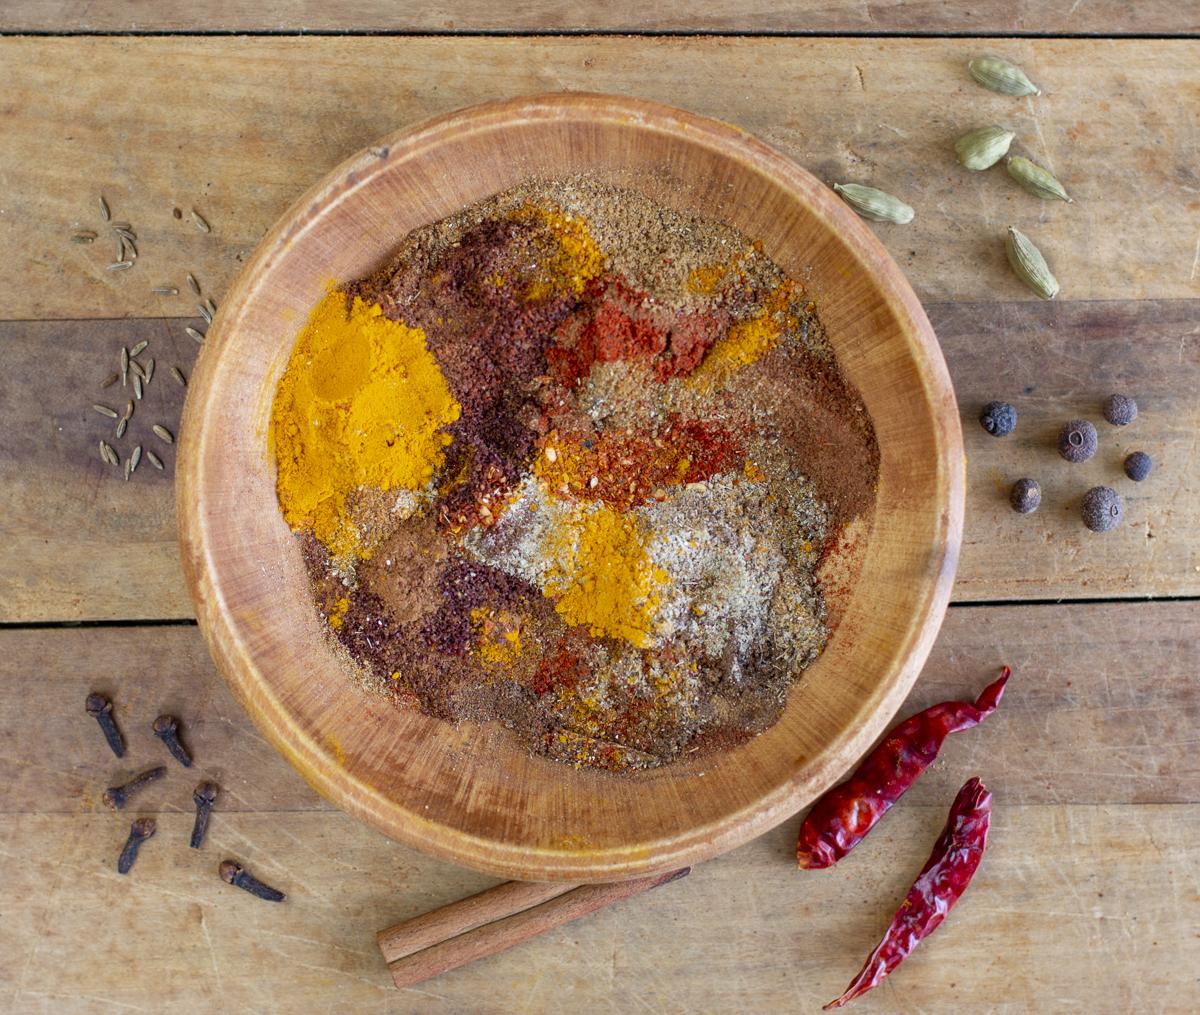 Iraqi Seasoning Mix with 11 seasonings in a vintage bowl